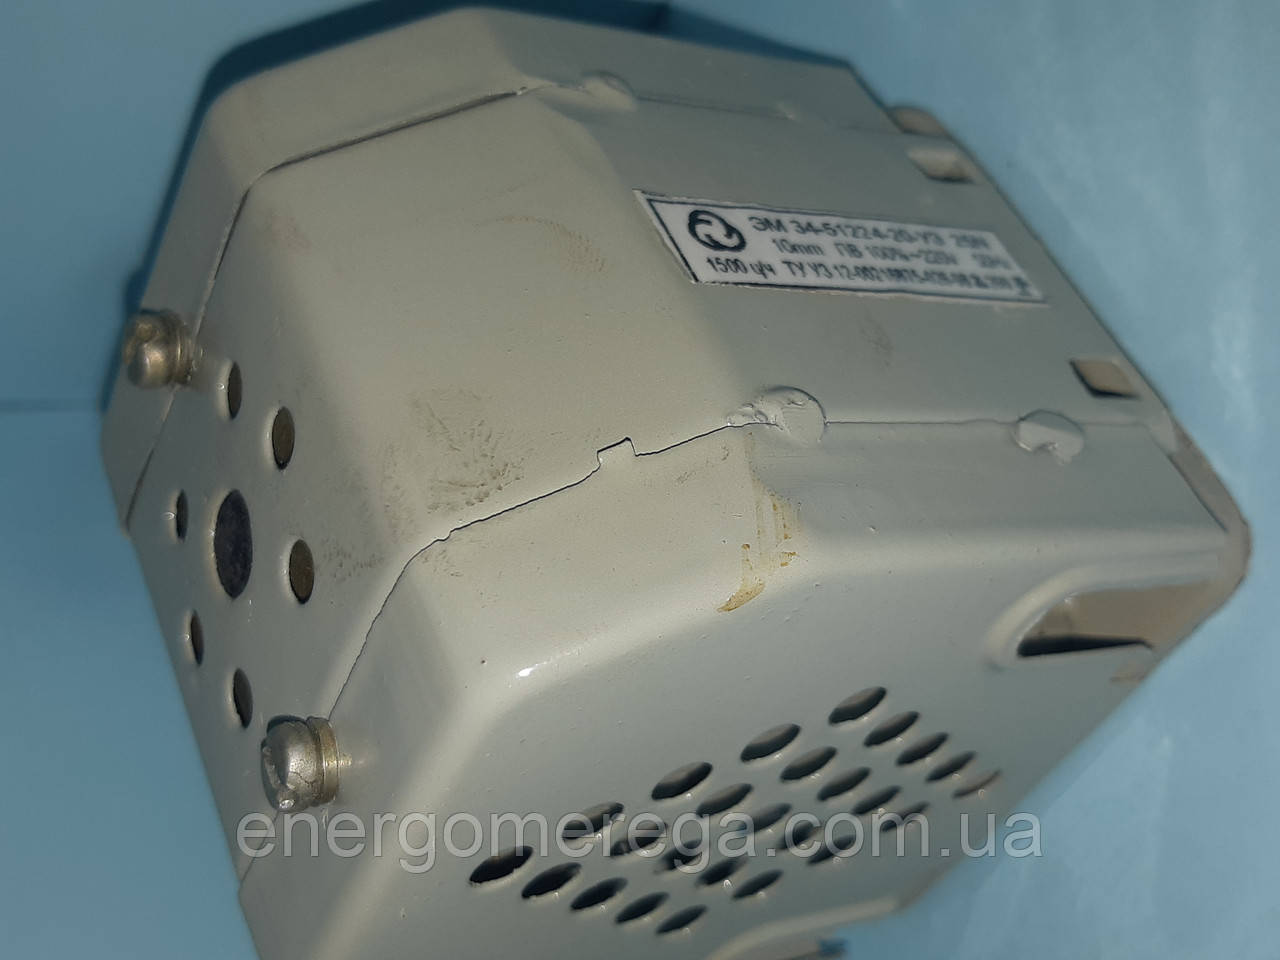 Электромагнит ЭМ 34-51241 110В